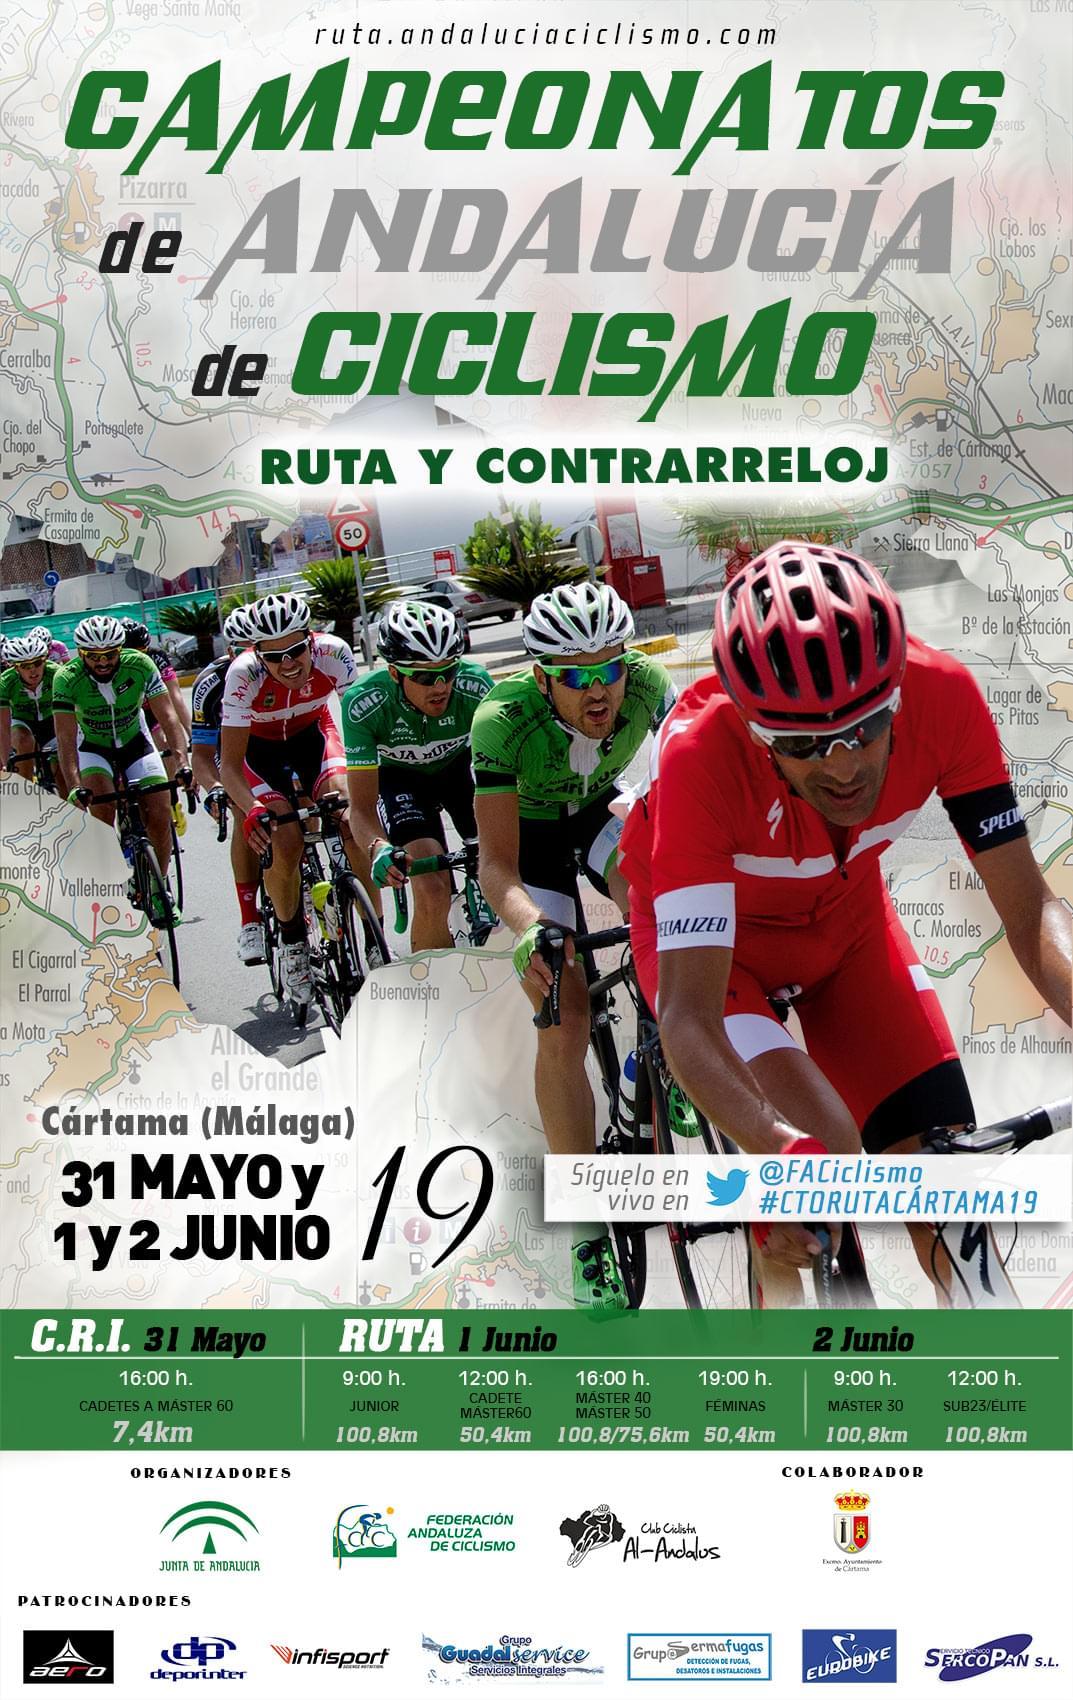 Campeonato de Andalucía ciclismo Cártama 2019